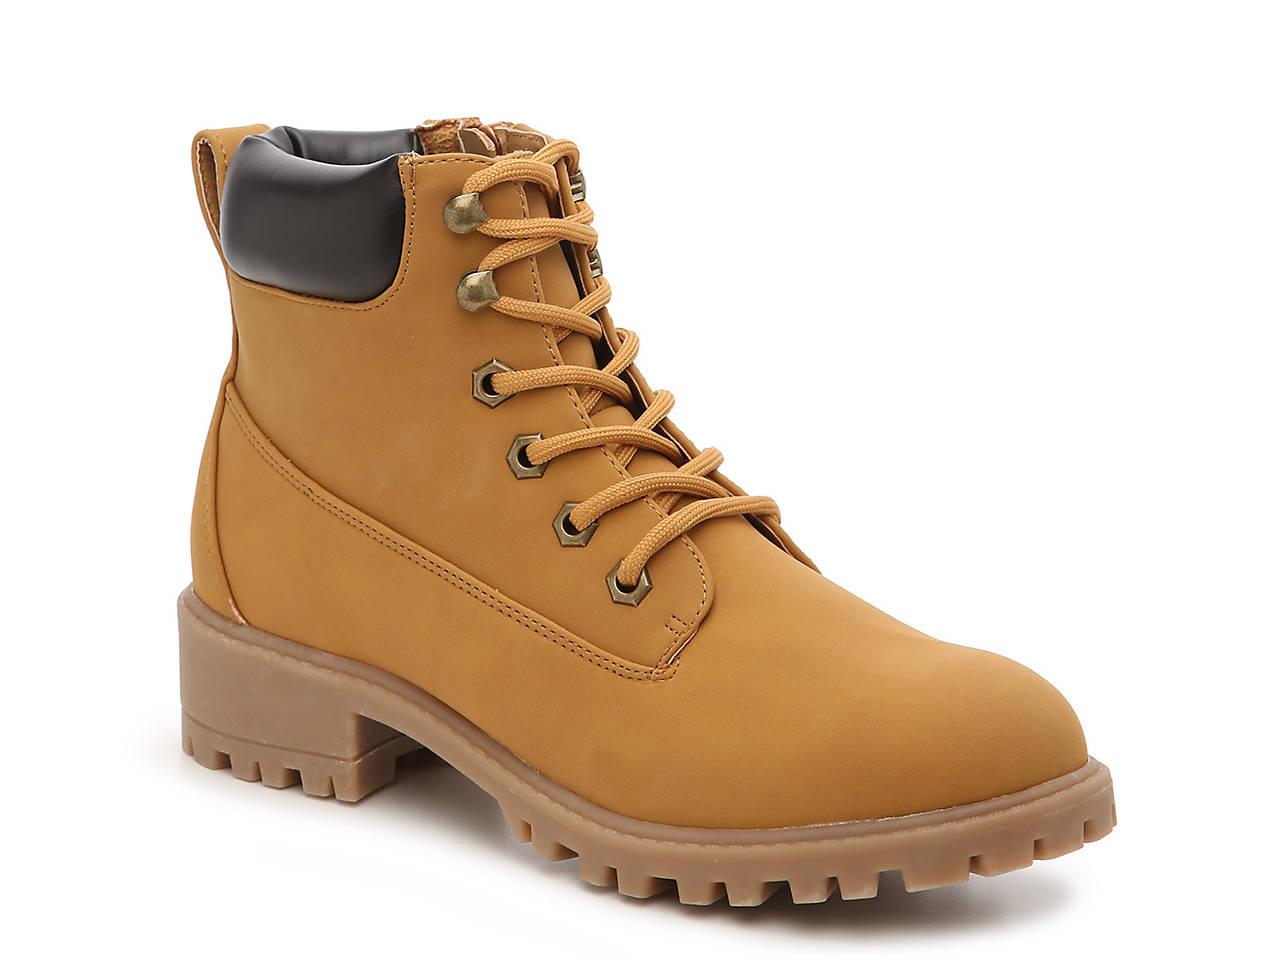 b2edc3ab152 Madden Girl Fflyn Bootie Women s Shoes